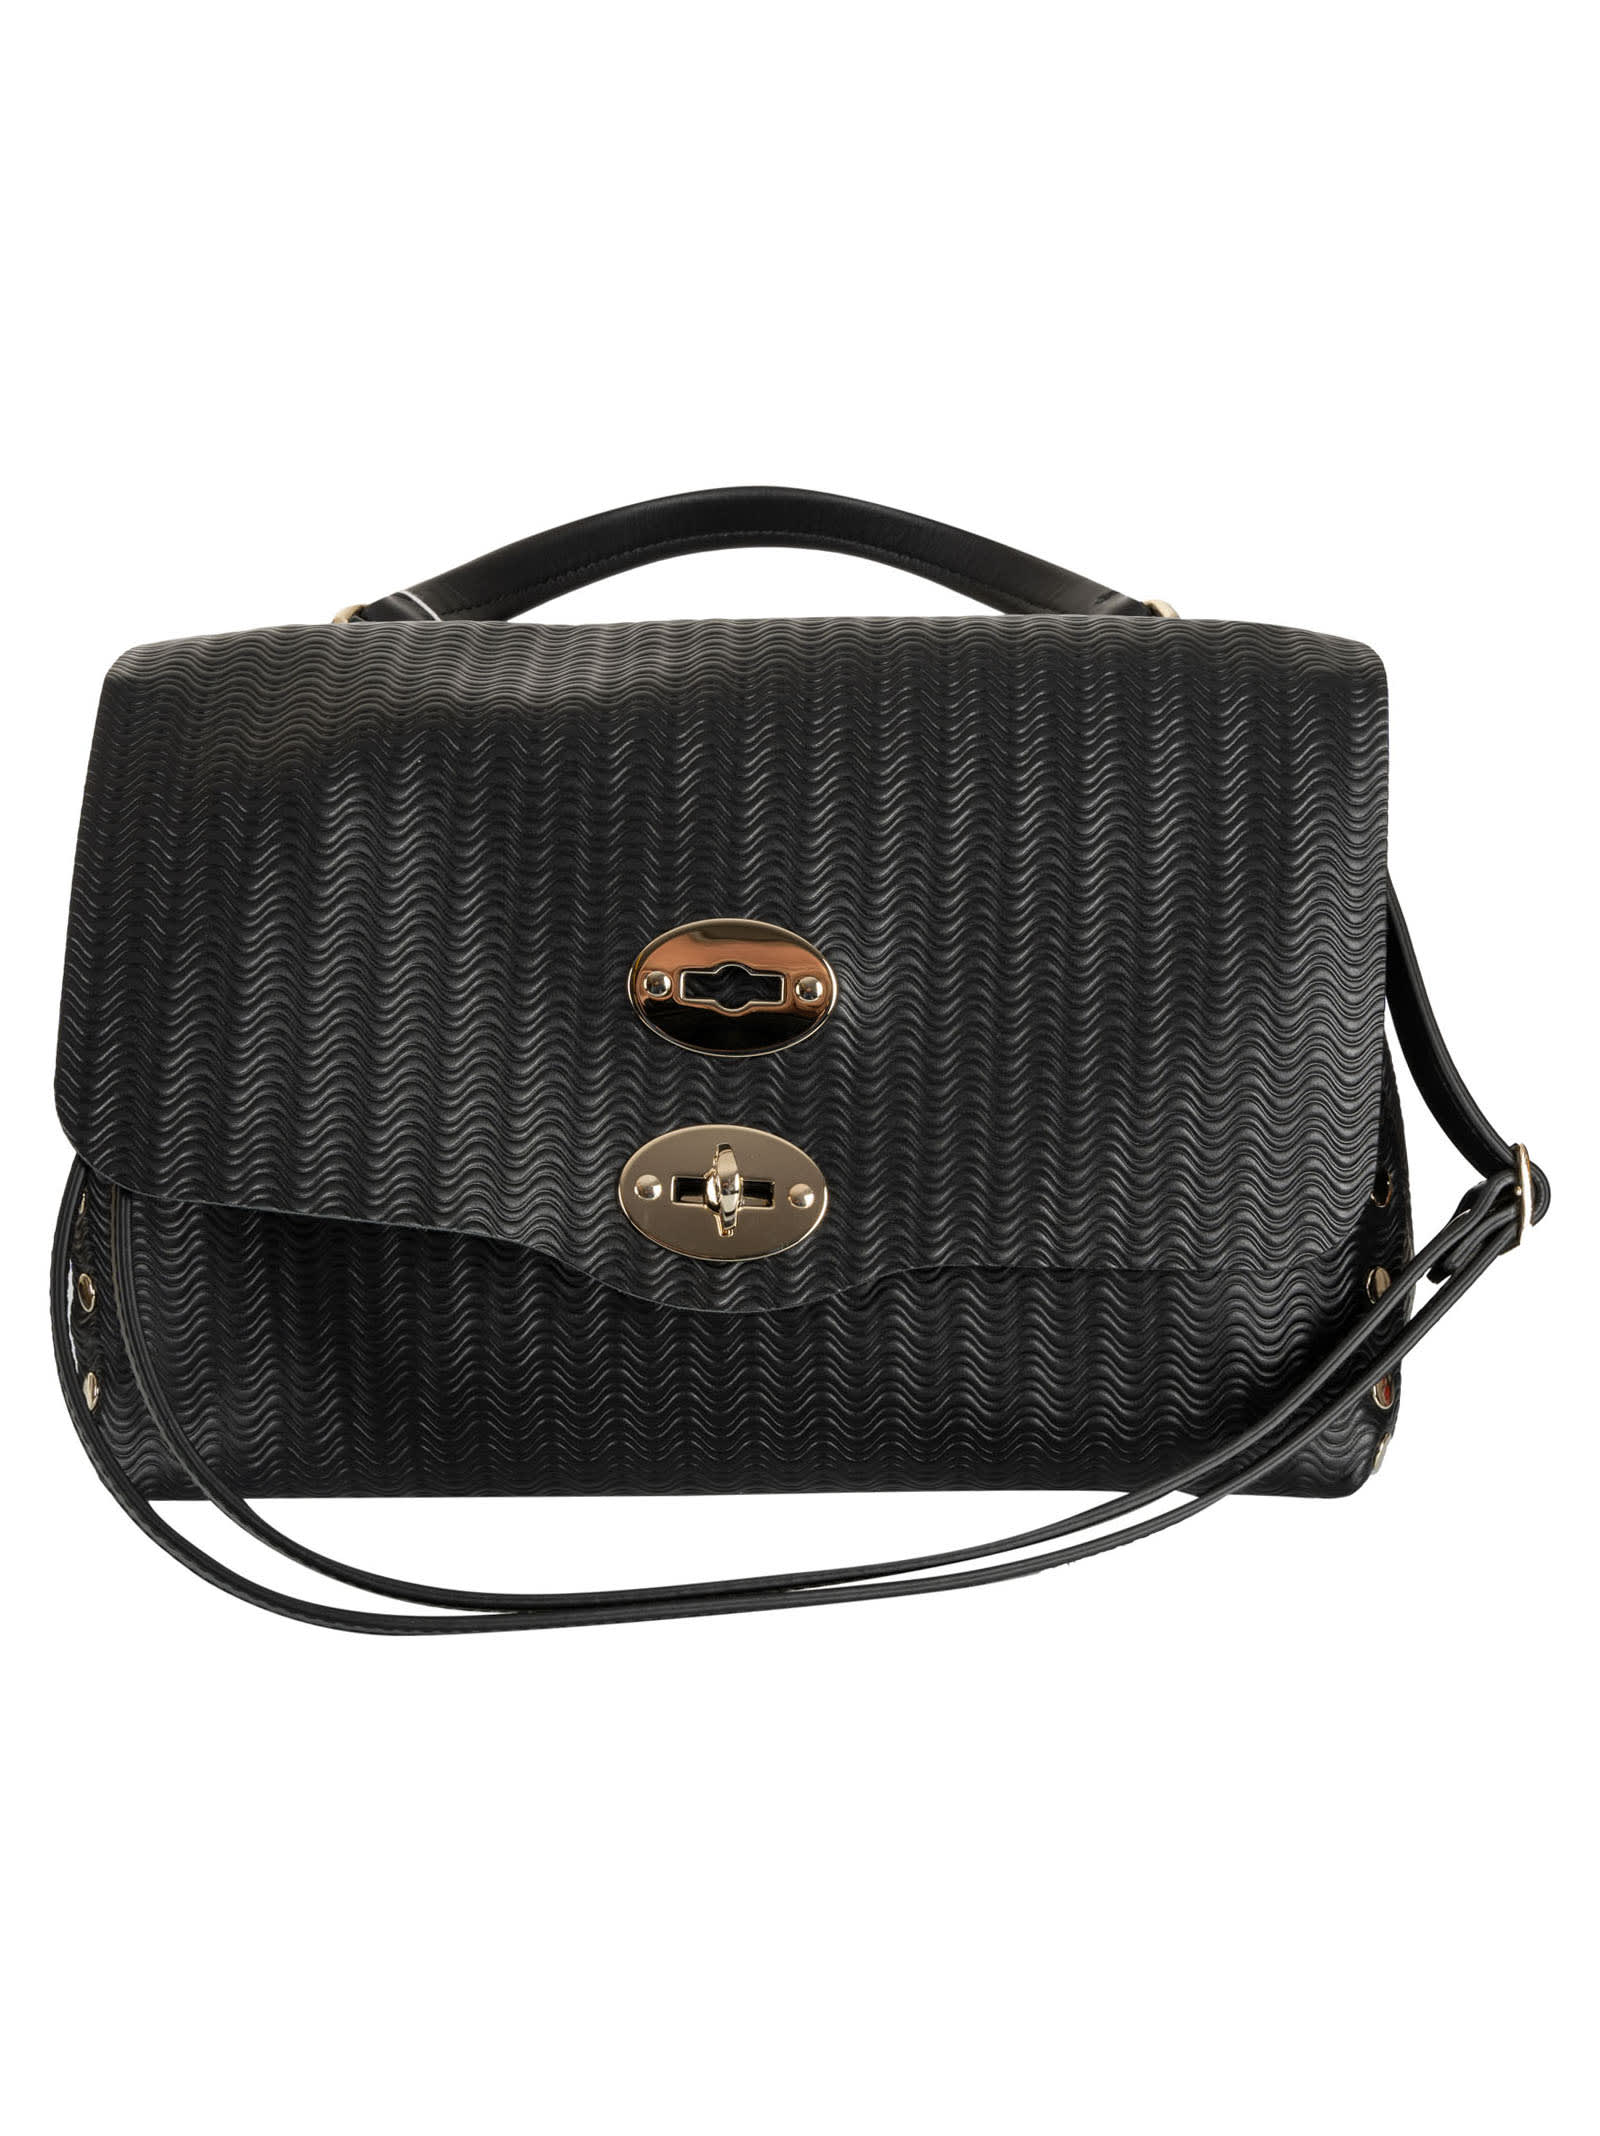 Zanellato Shoulder bags SMALL POSTINA SHOULDER BAG